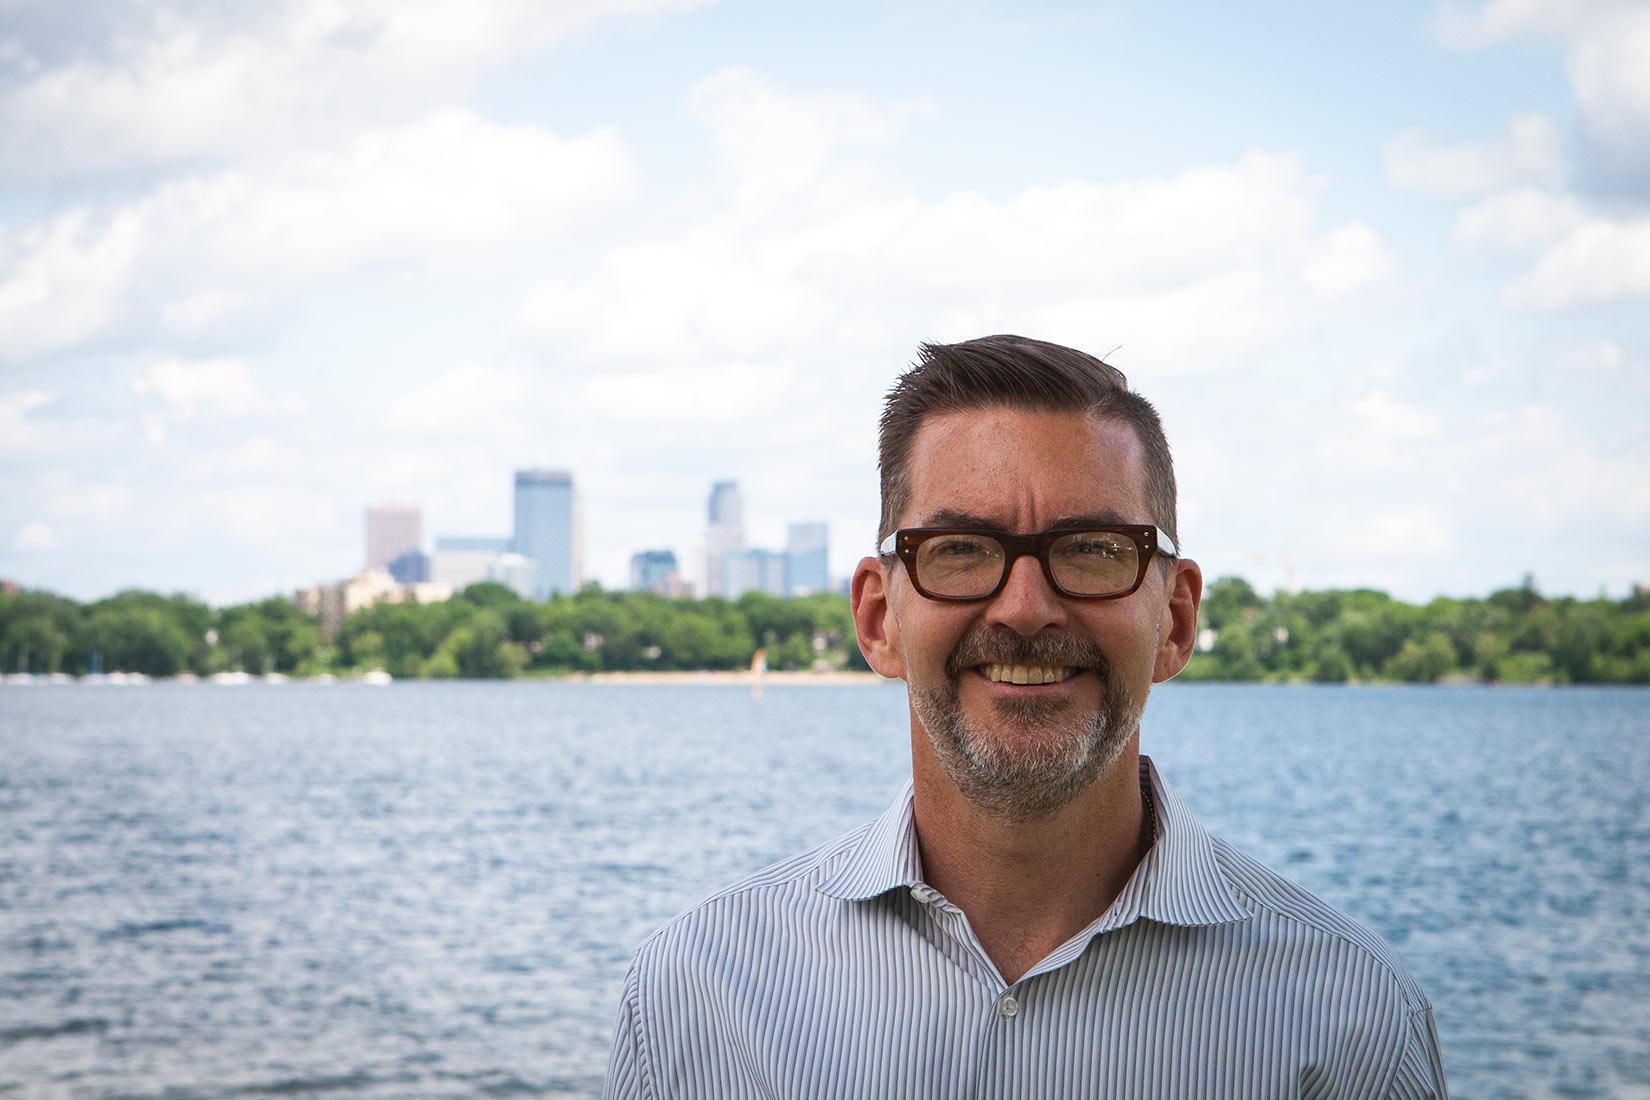 Scott Candidate Portrait 2016 1 - IMG_7334.jpg